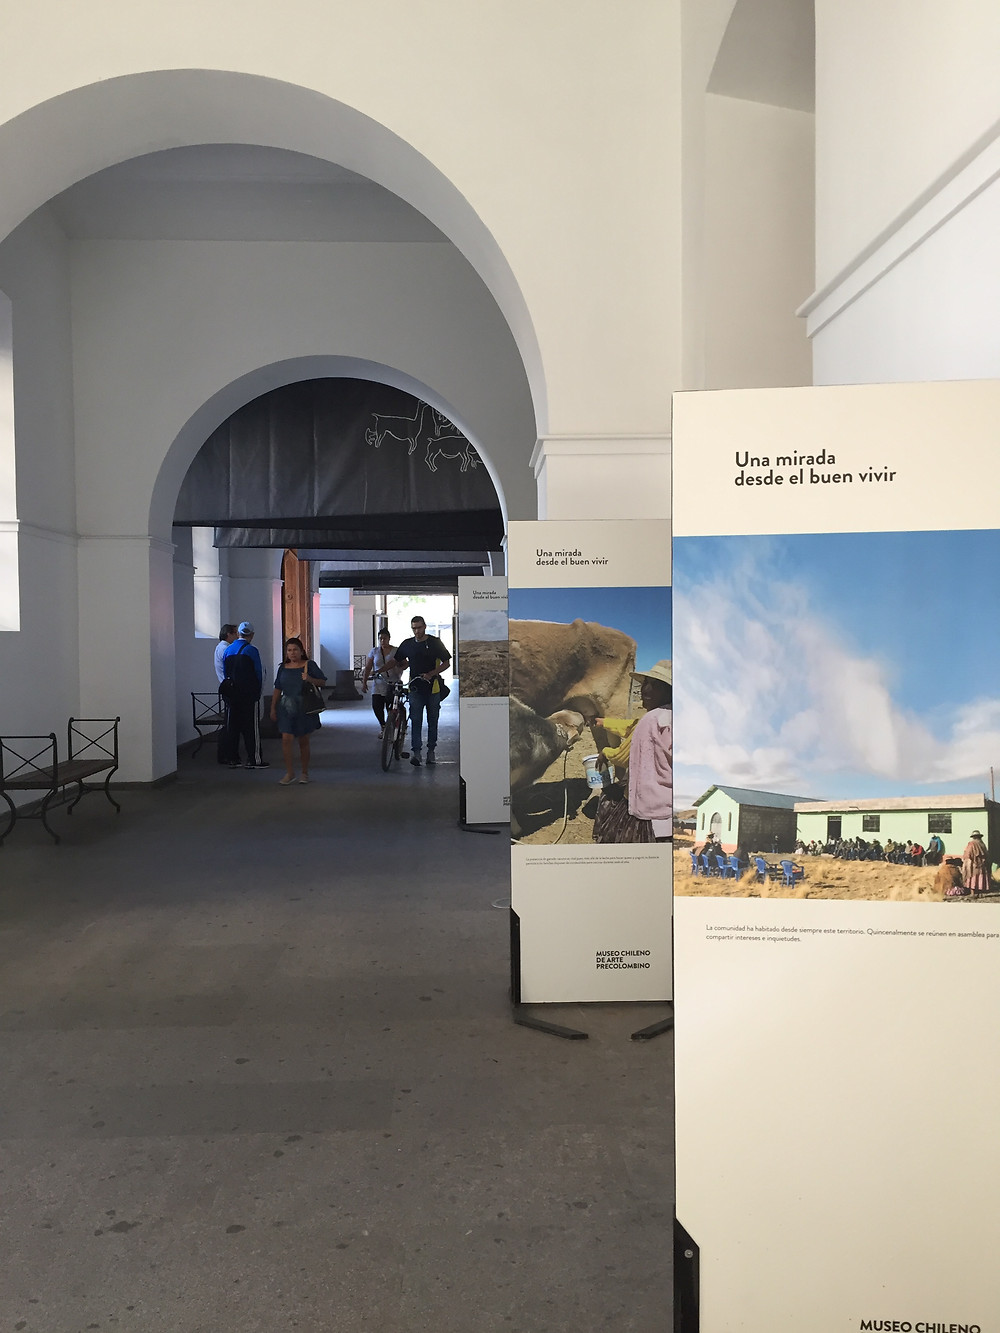 Музей доколумбовой эпохи Паласио-де-ла-Реаль-Адуана | skitour.club | Блог Сергея Чеботова